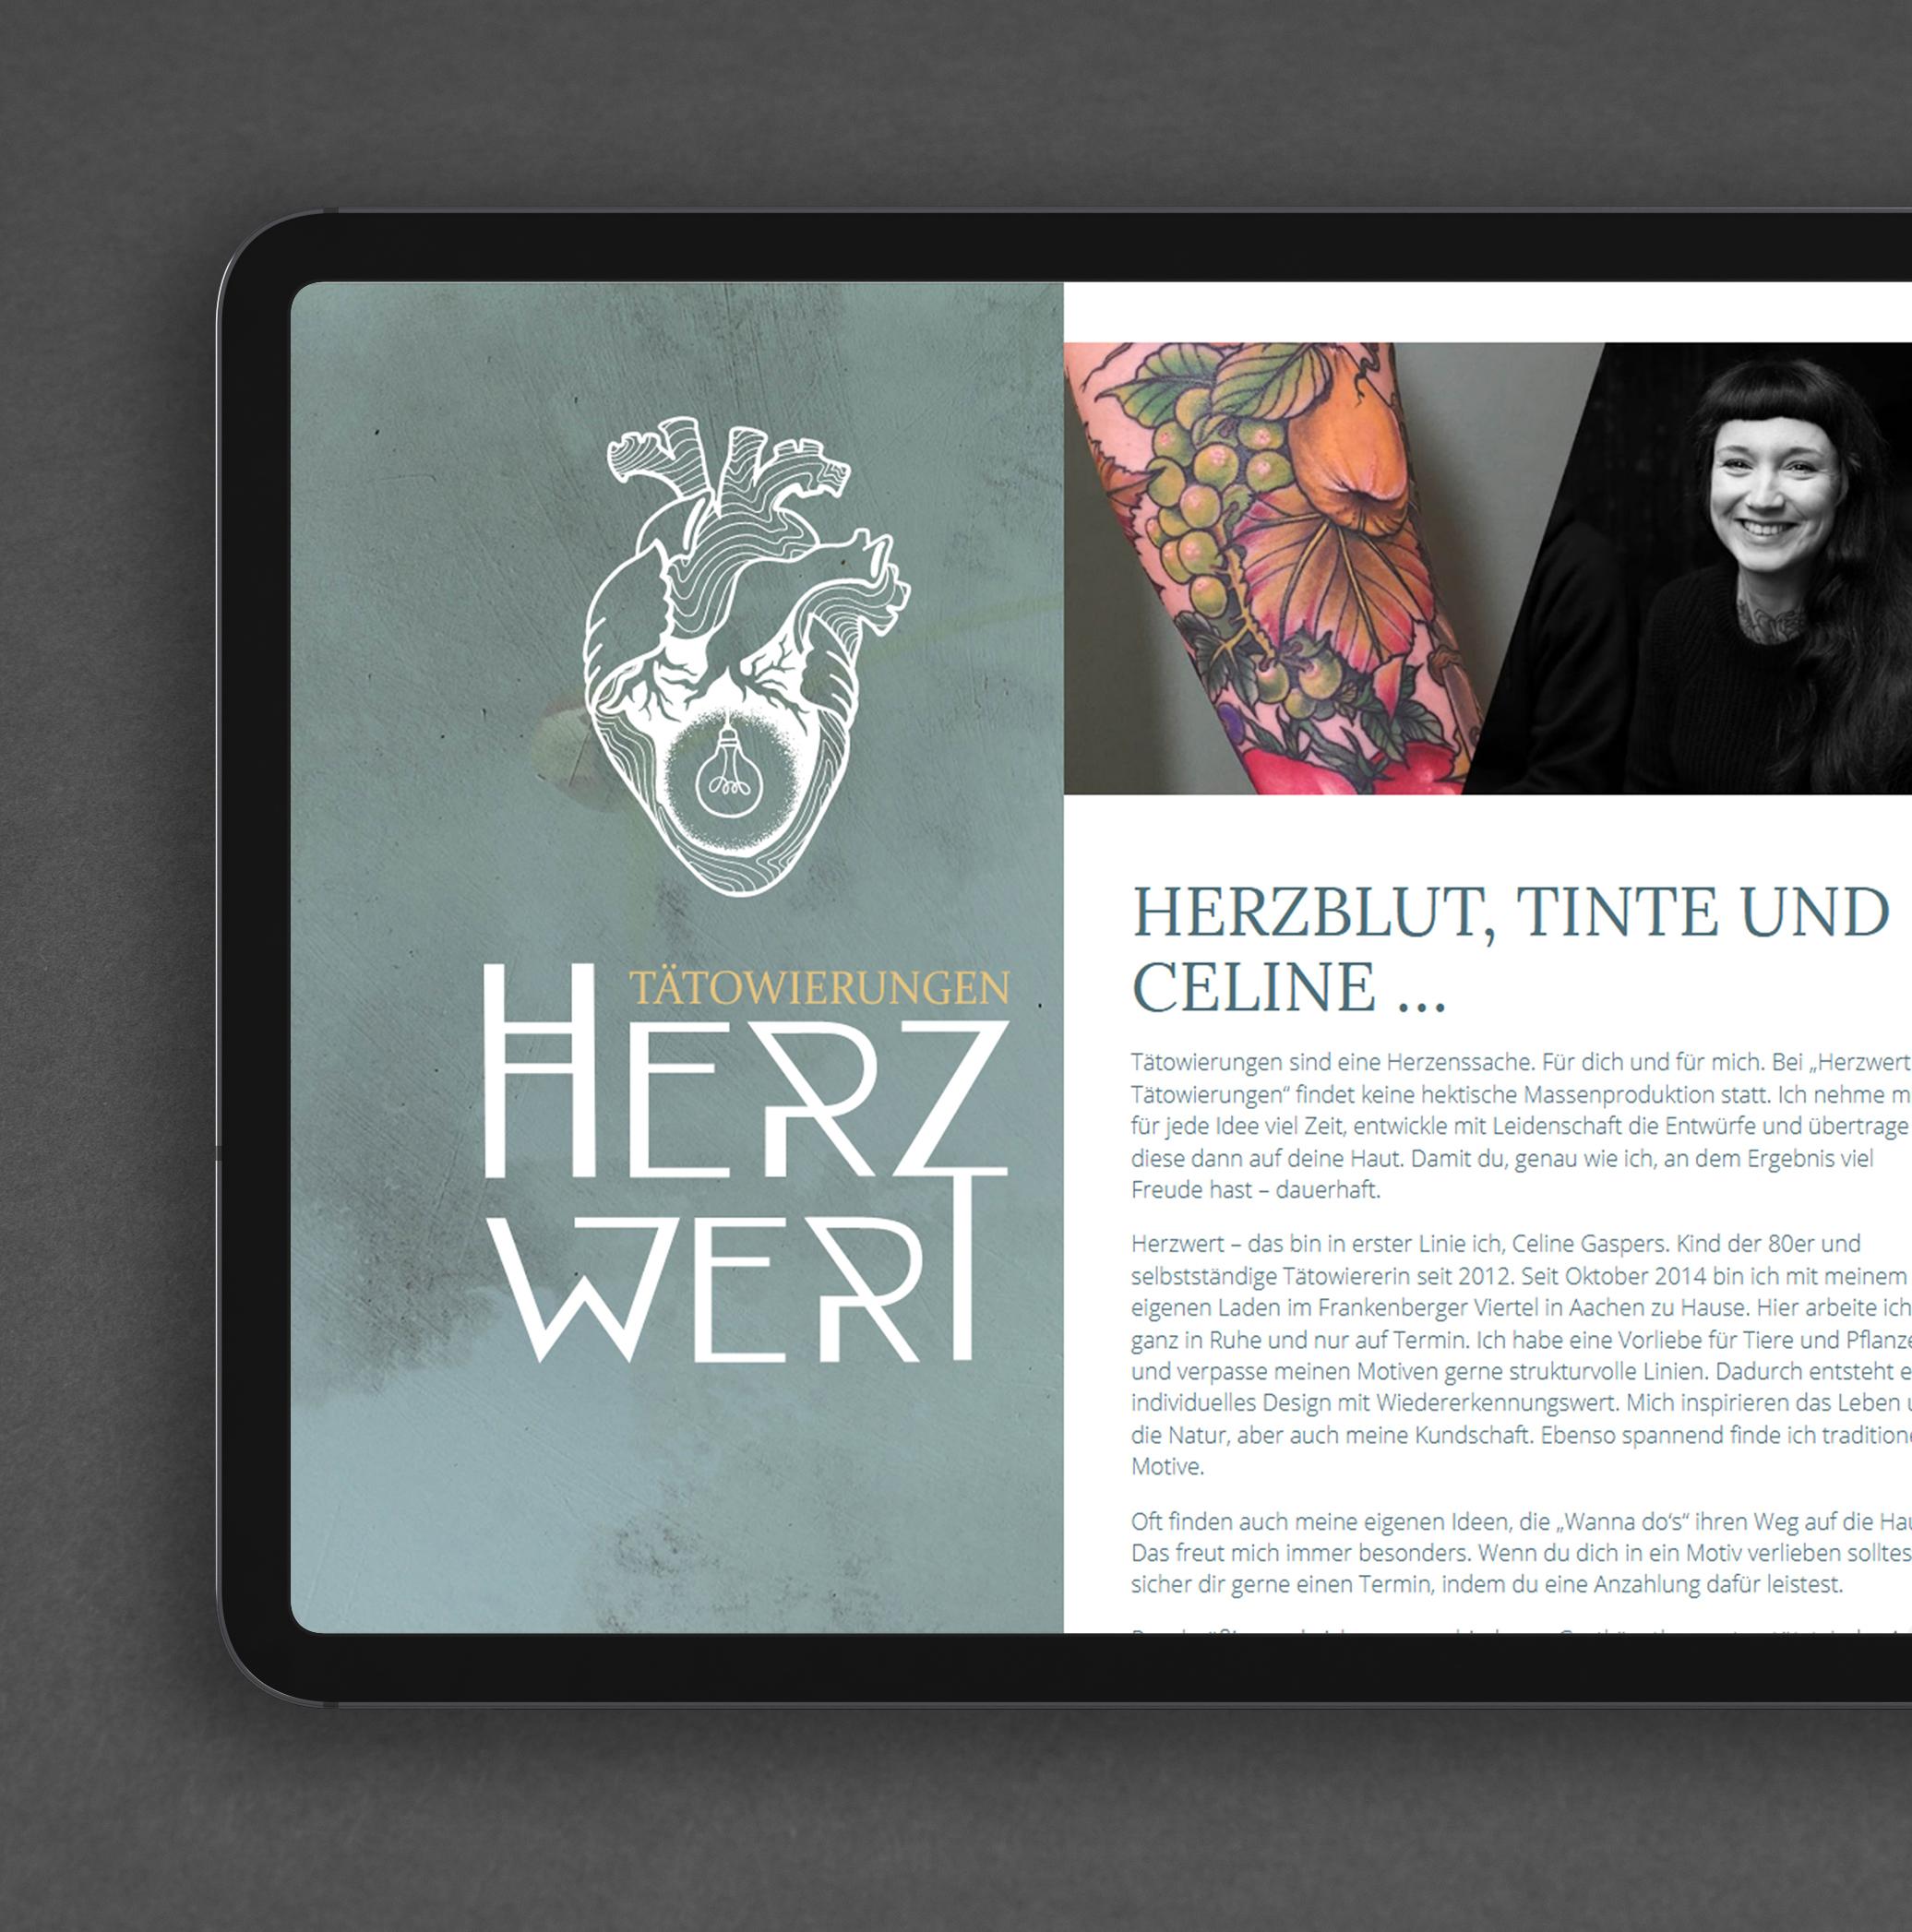 Herzwert Webdesign aud dem iPad